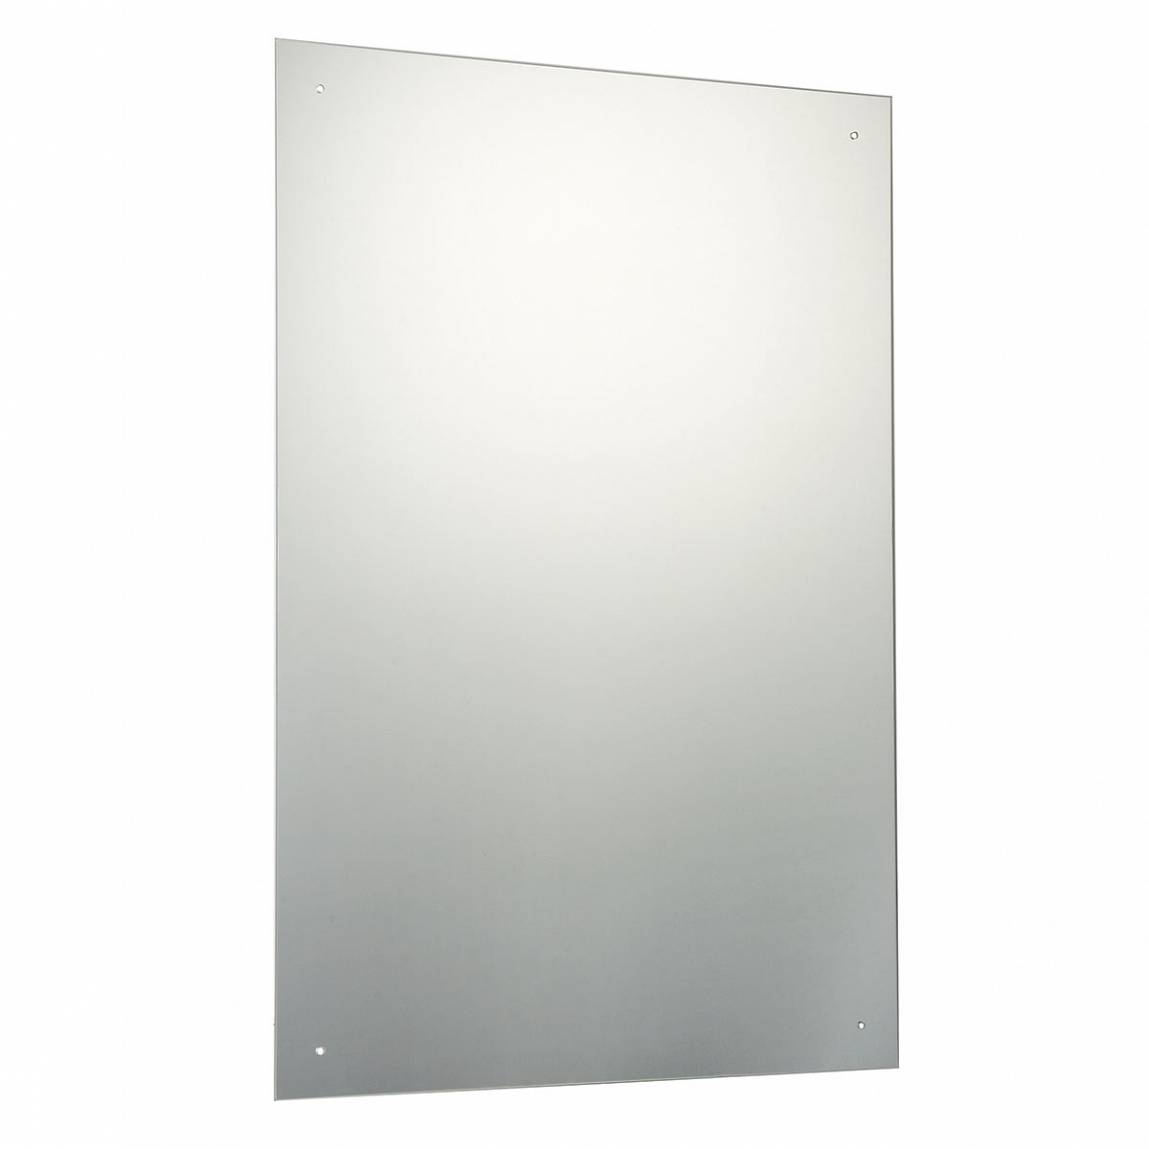 Image of Rectangular Drilled Mirror 60x90cm